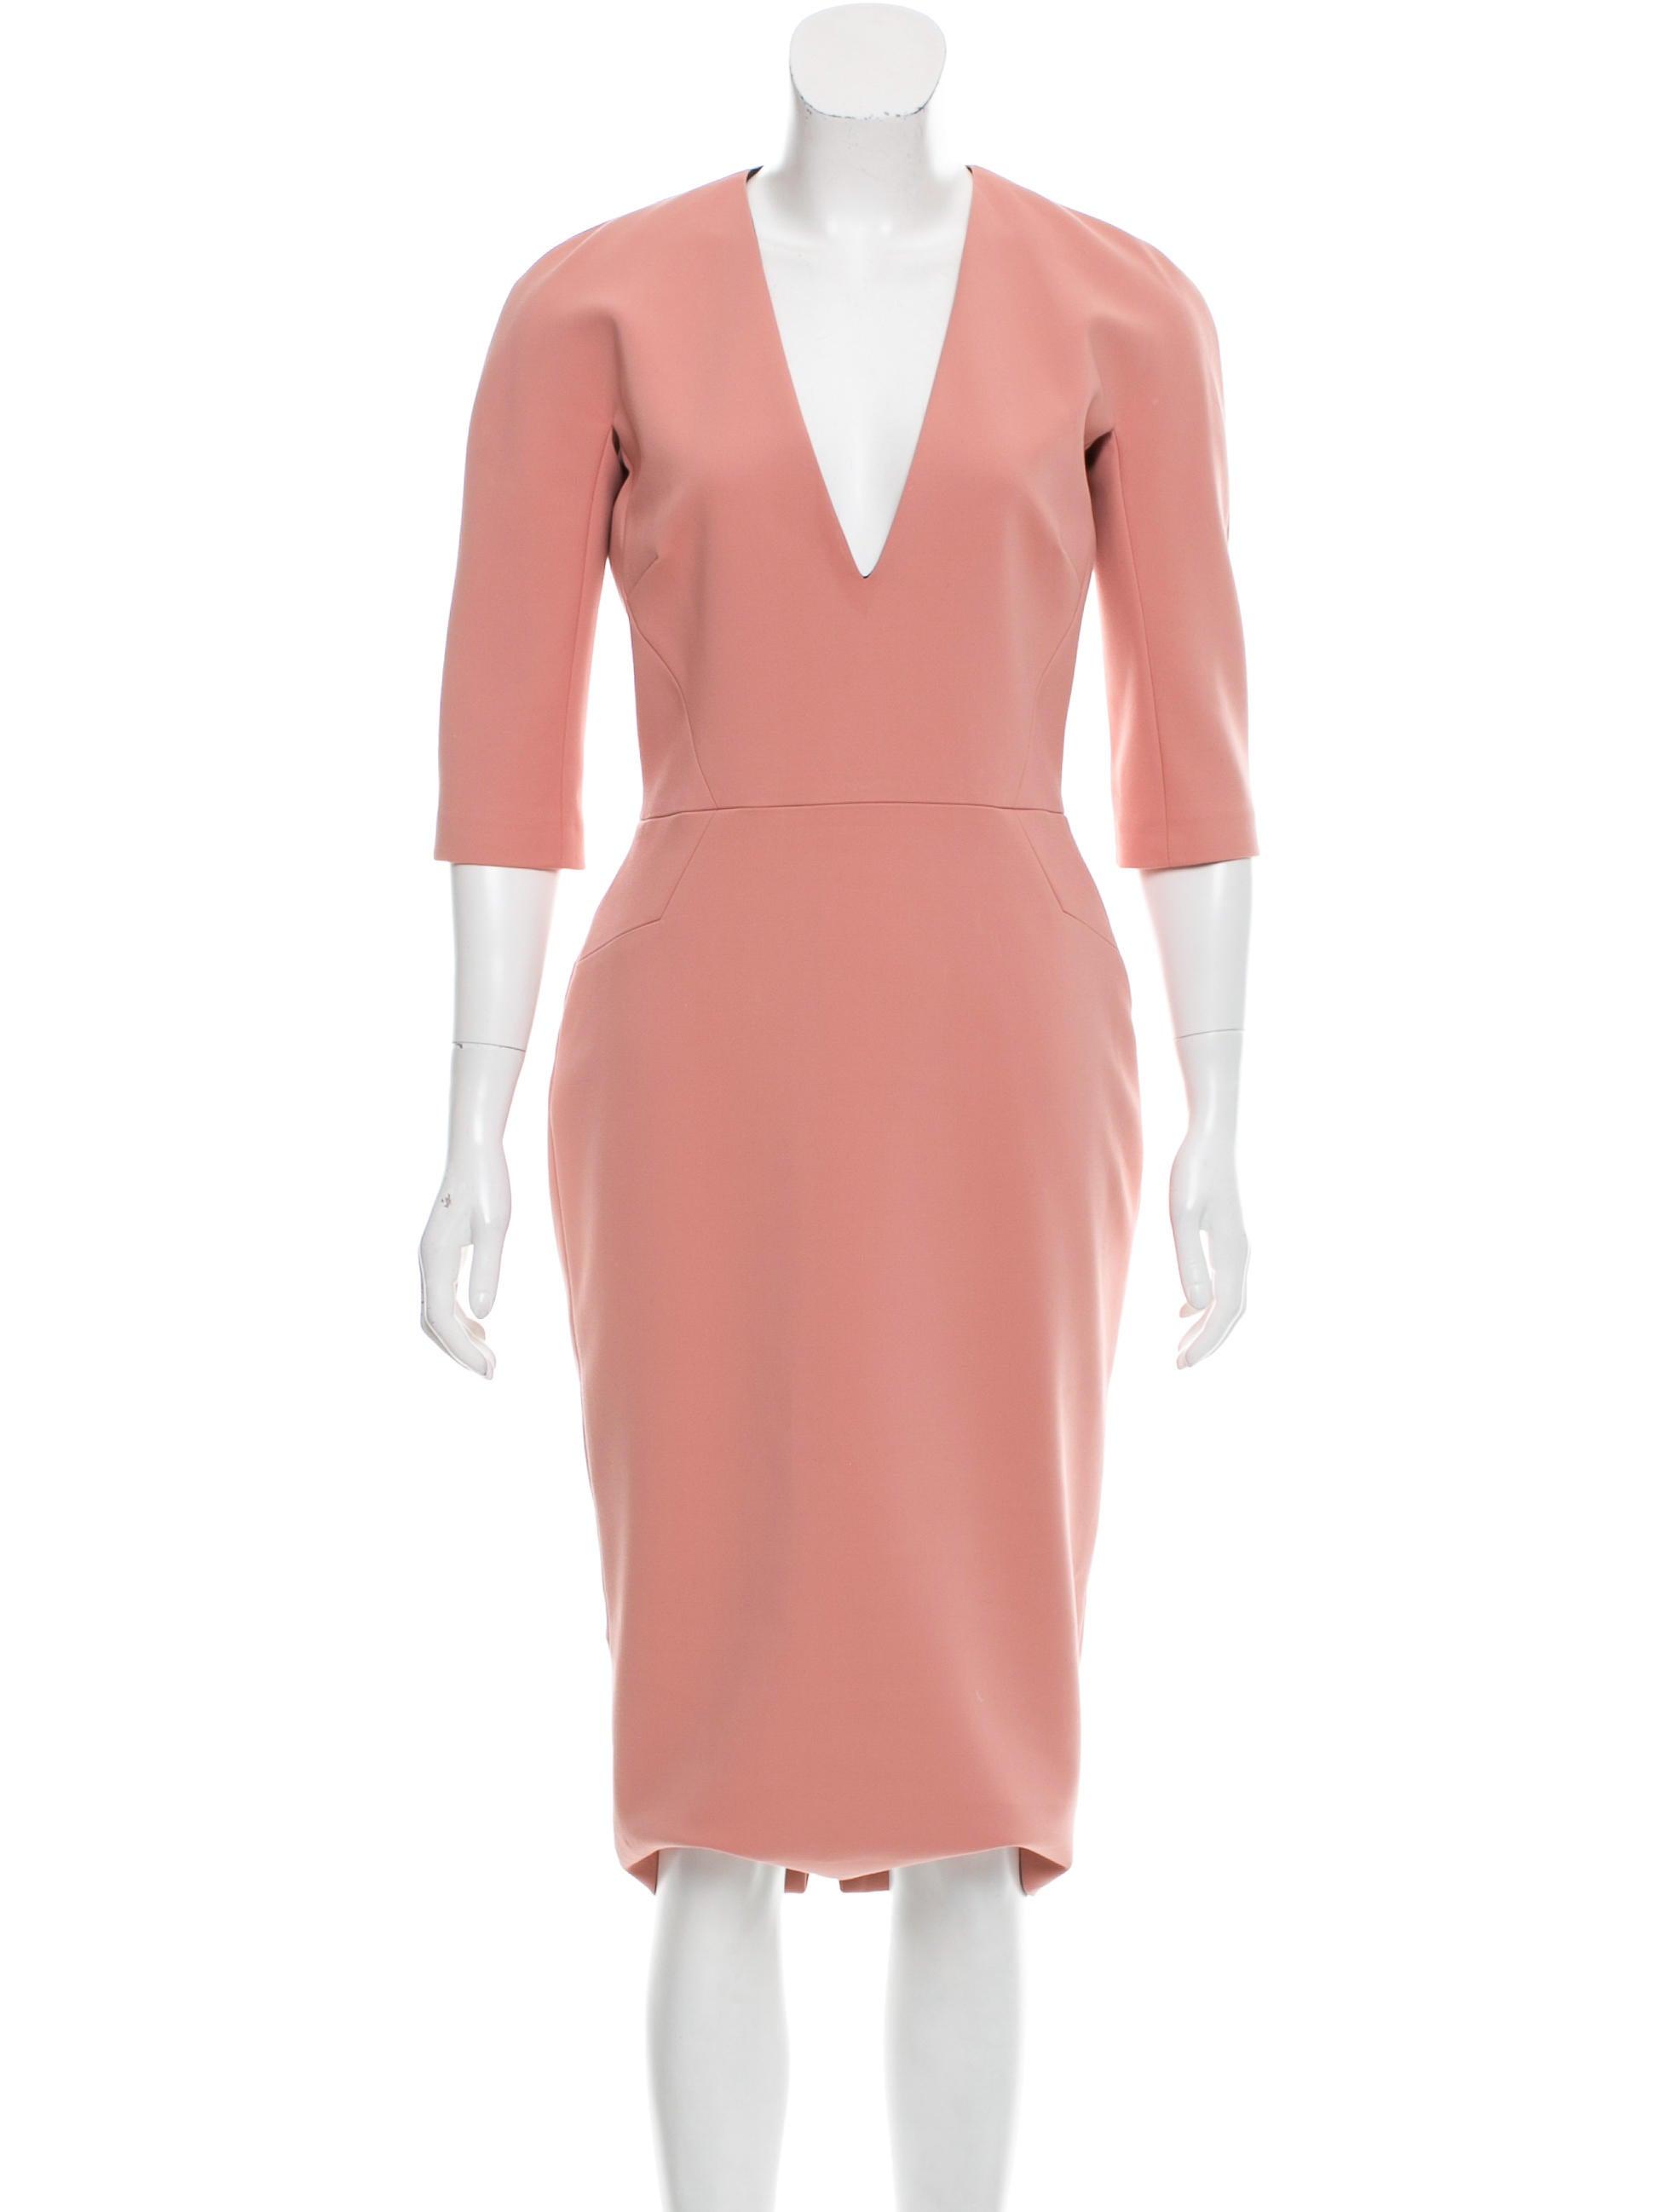 Victoria Beckham V Neck Midi Dress Clothing Vbk22409